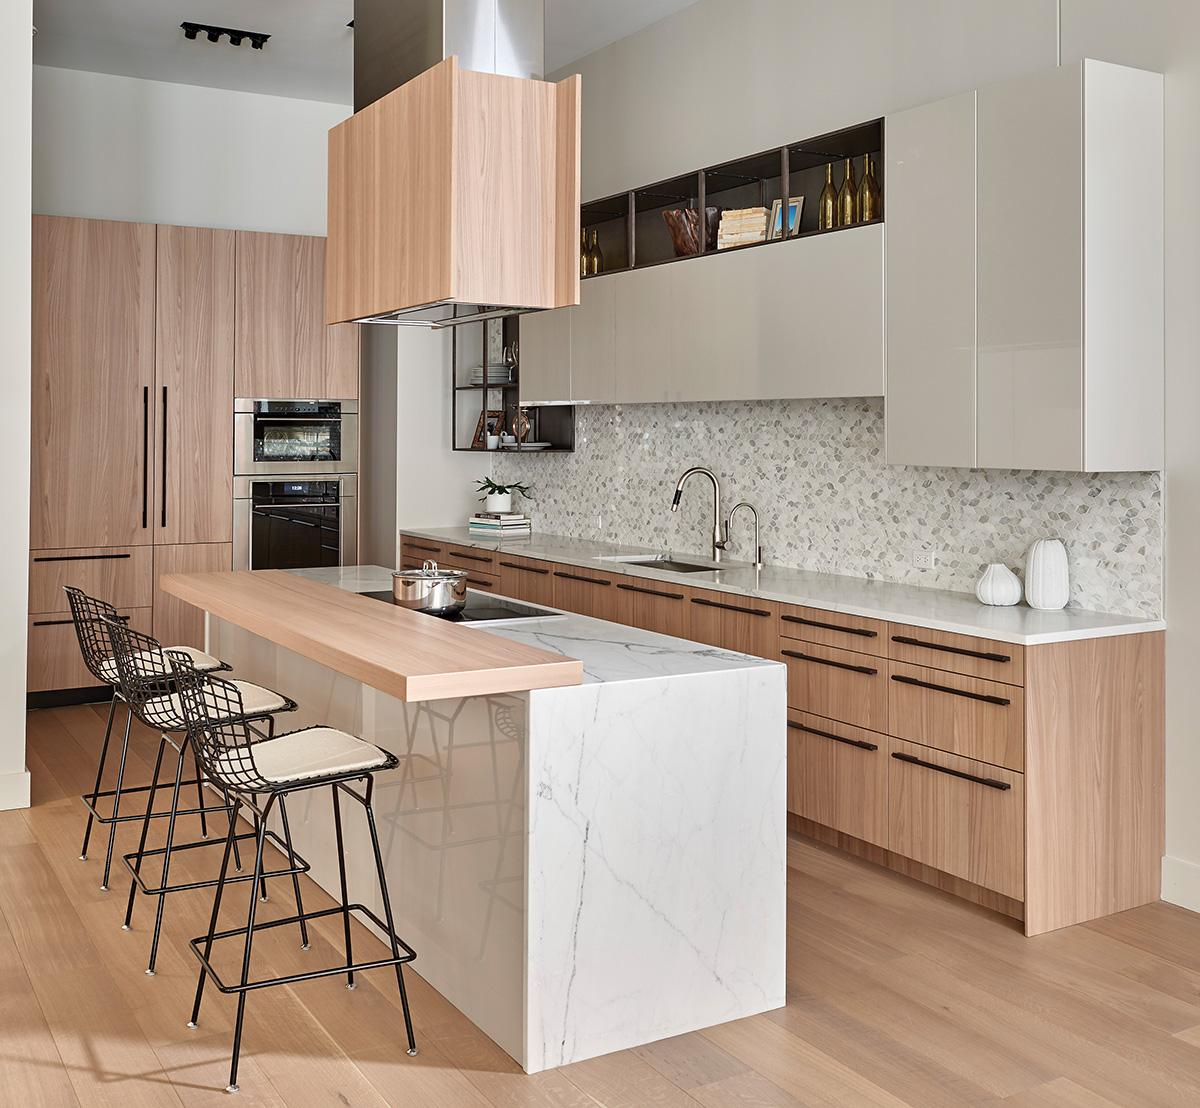 210-Design-House_0119623